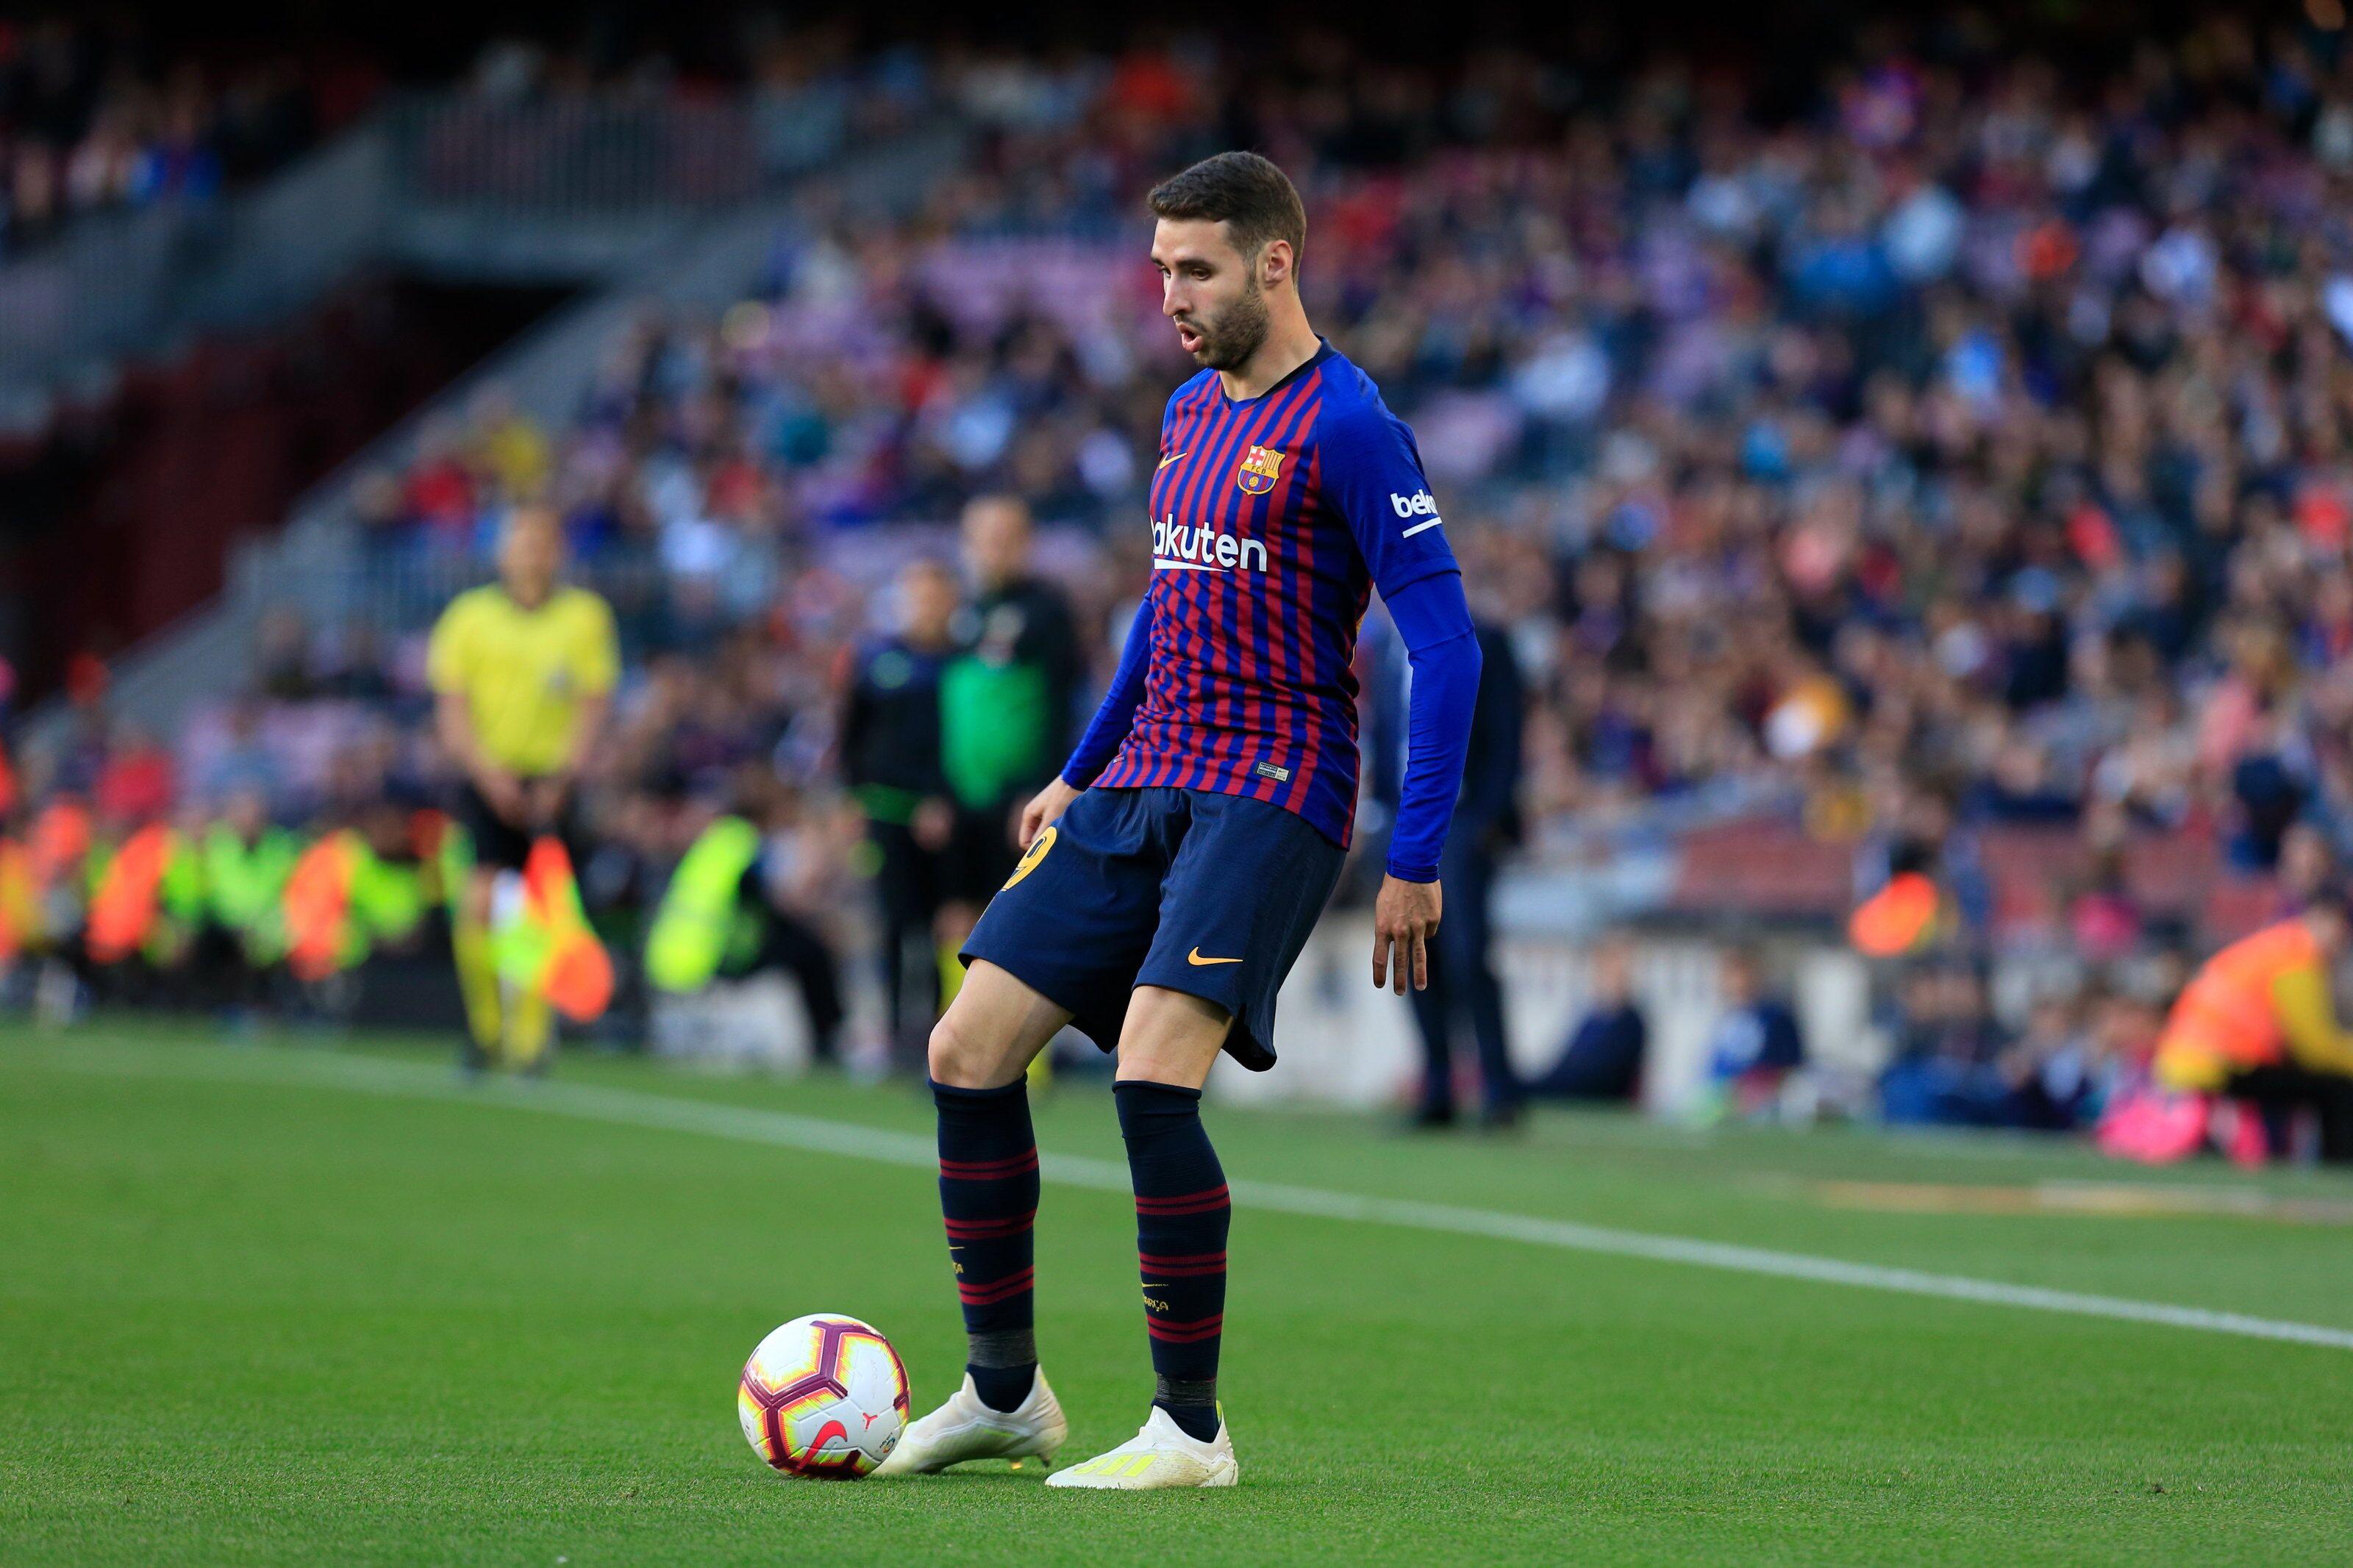 Eibar vs Barcelona: Expected Starting XI for end-of-season league clash